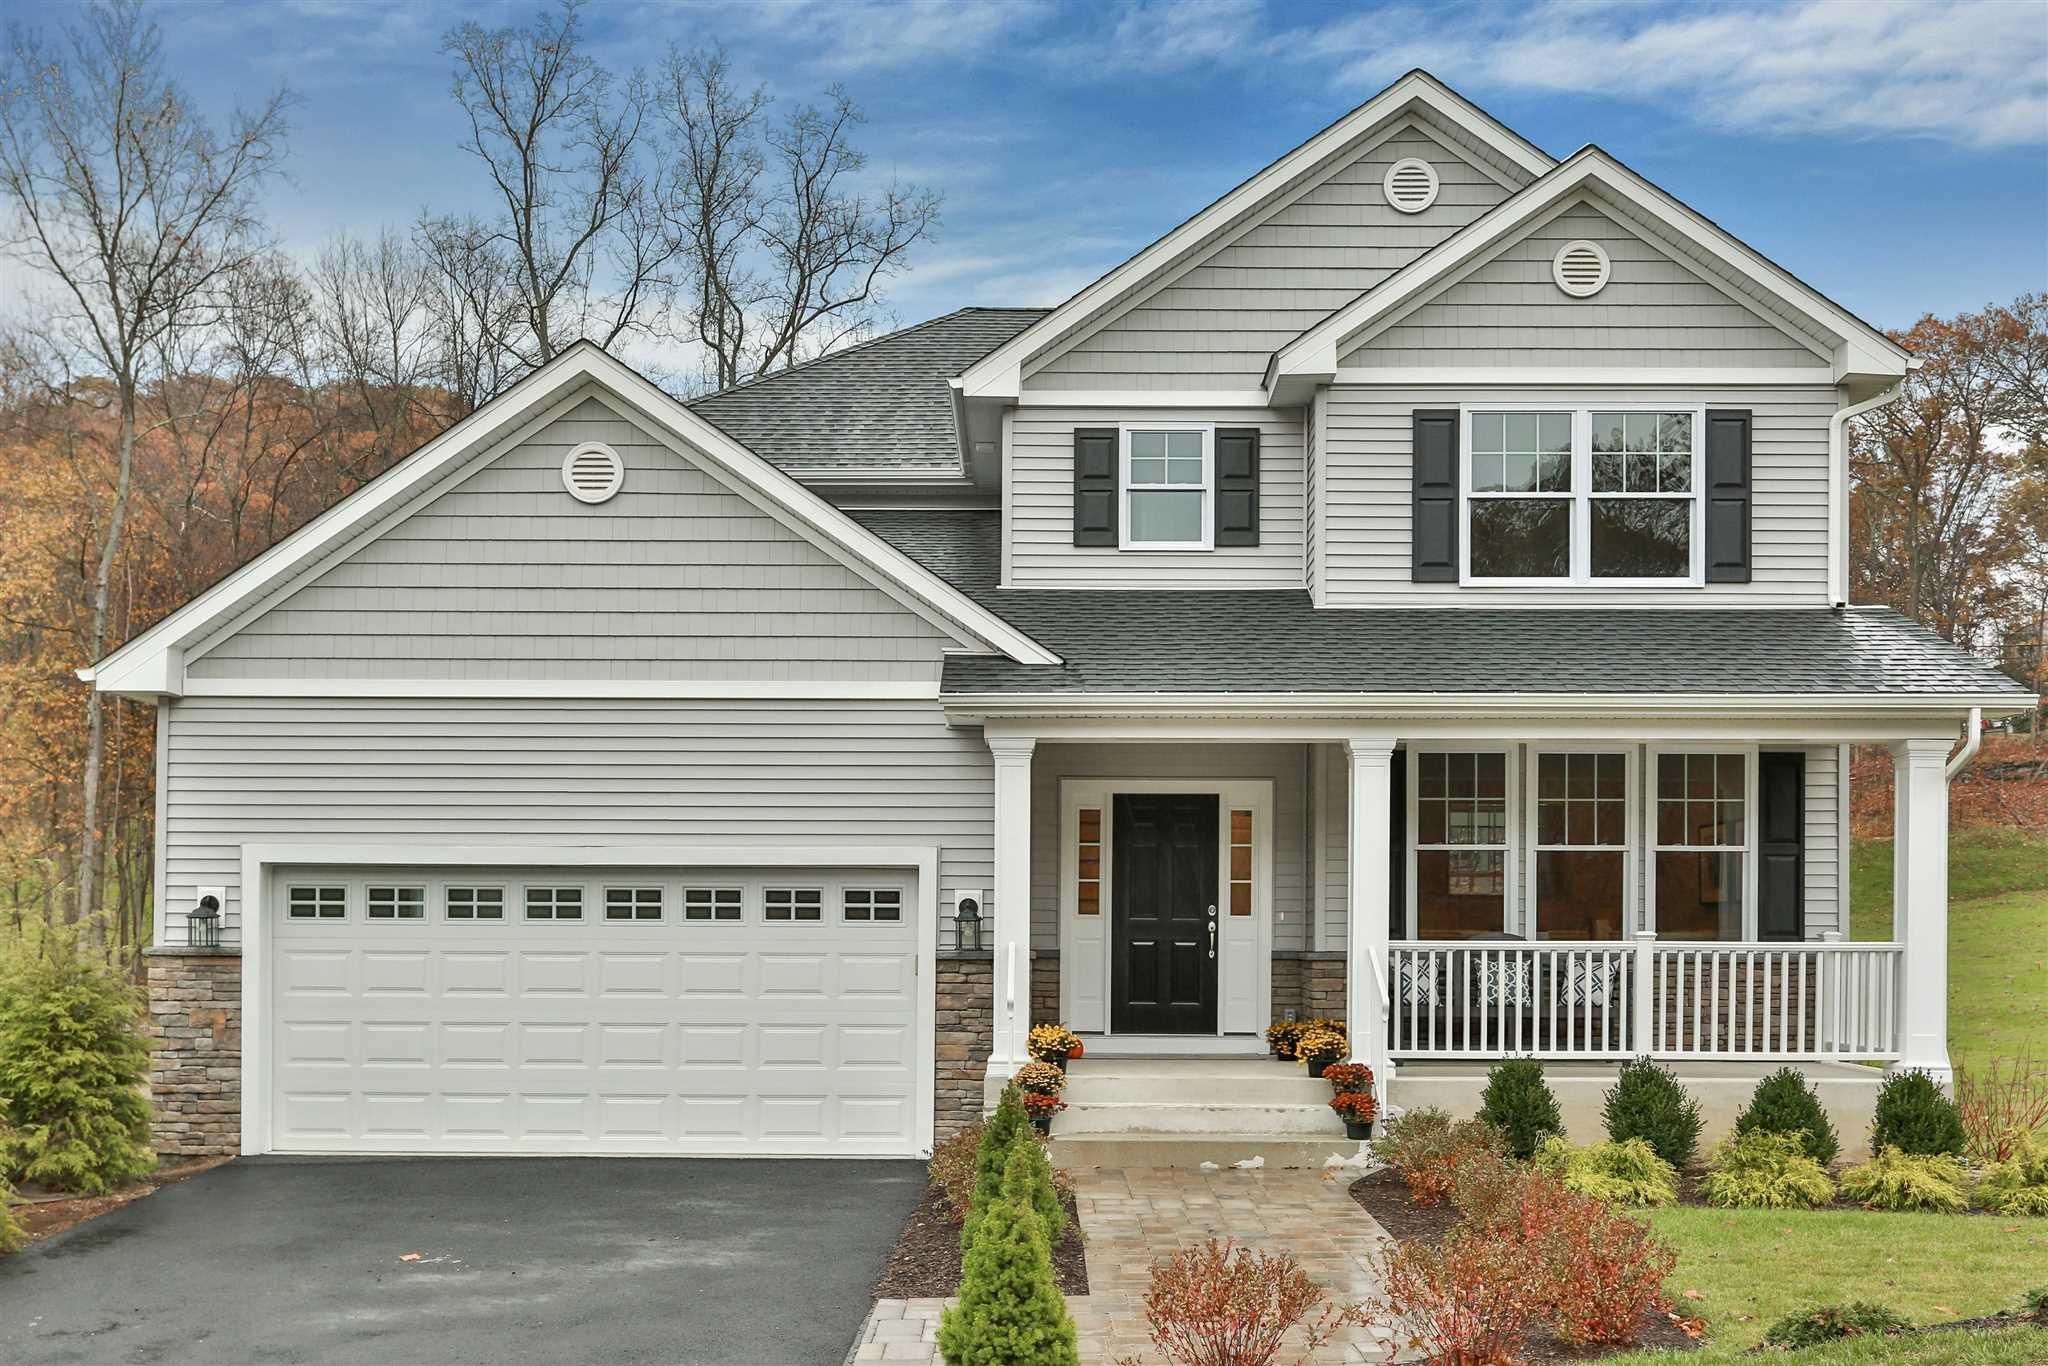 Single Family Home for Sale at 52 NORTH RIDGE ROAD 52 NORTH RIDGE ROAD Carmel, New York 10541 United States